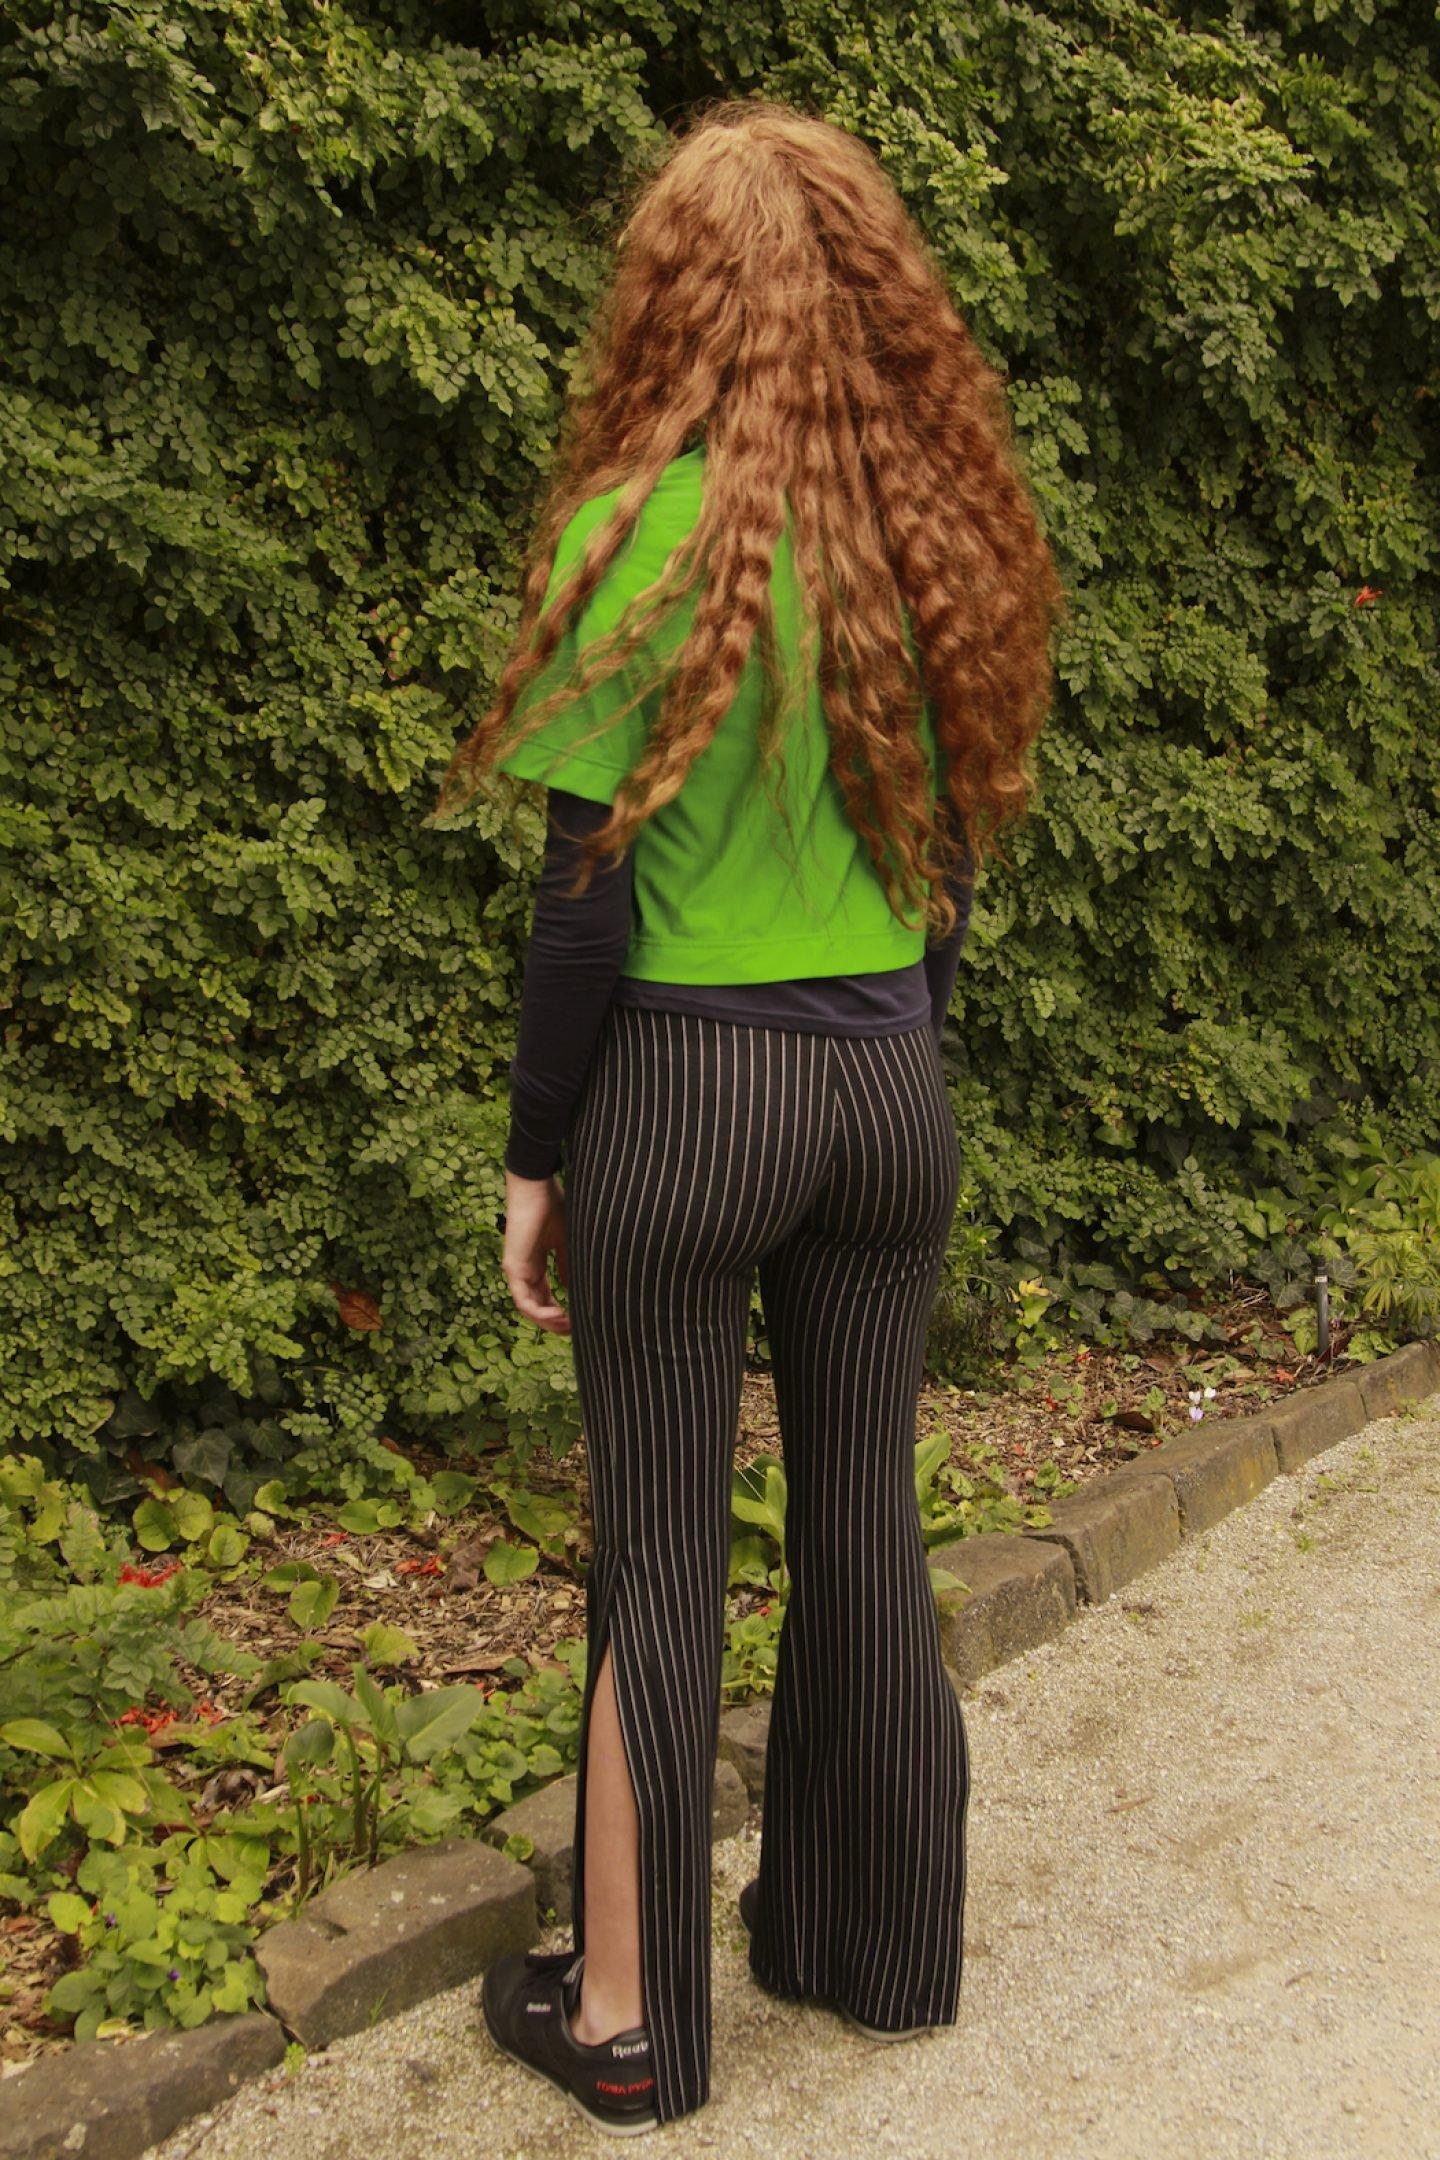 neverland_fashion_019